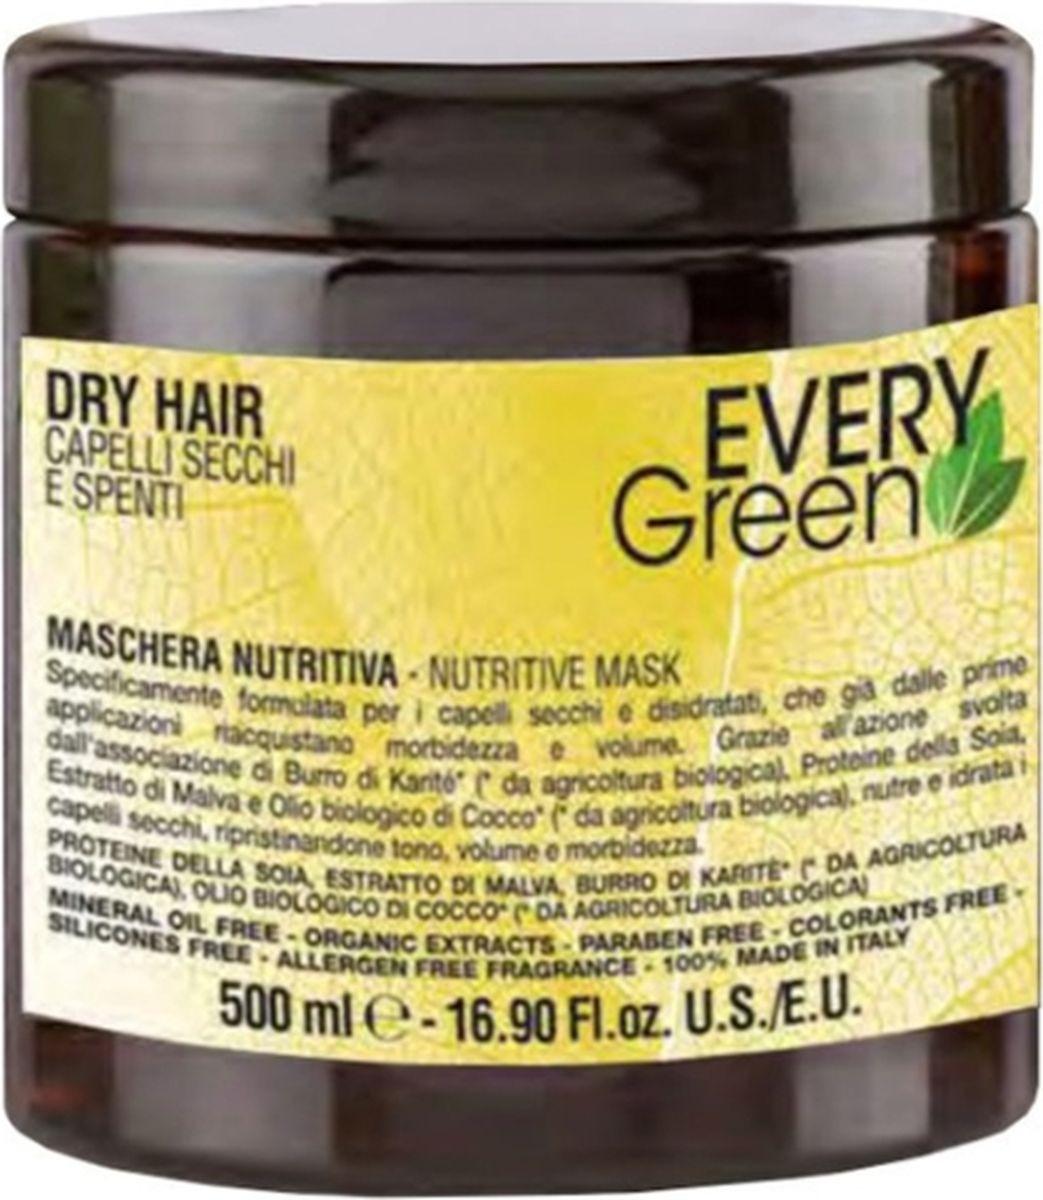 набор в тубе для сухих волос dry hair set 200 250 мл Маска для волос Dikson Dry Hair Mashera Nutriente, для сухих, 500 мл